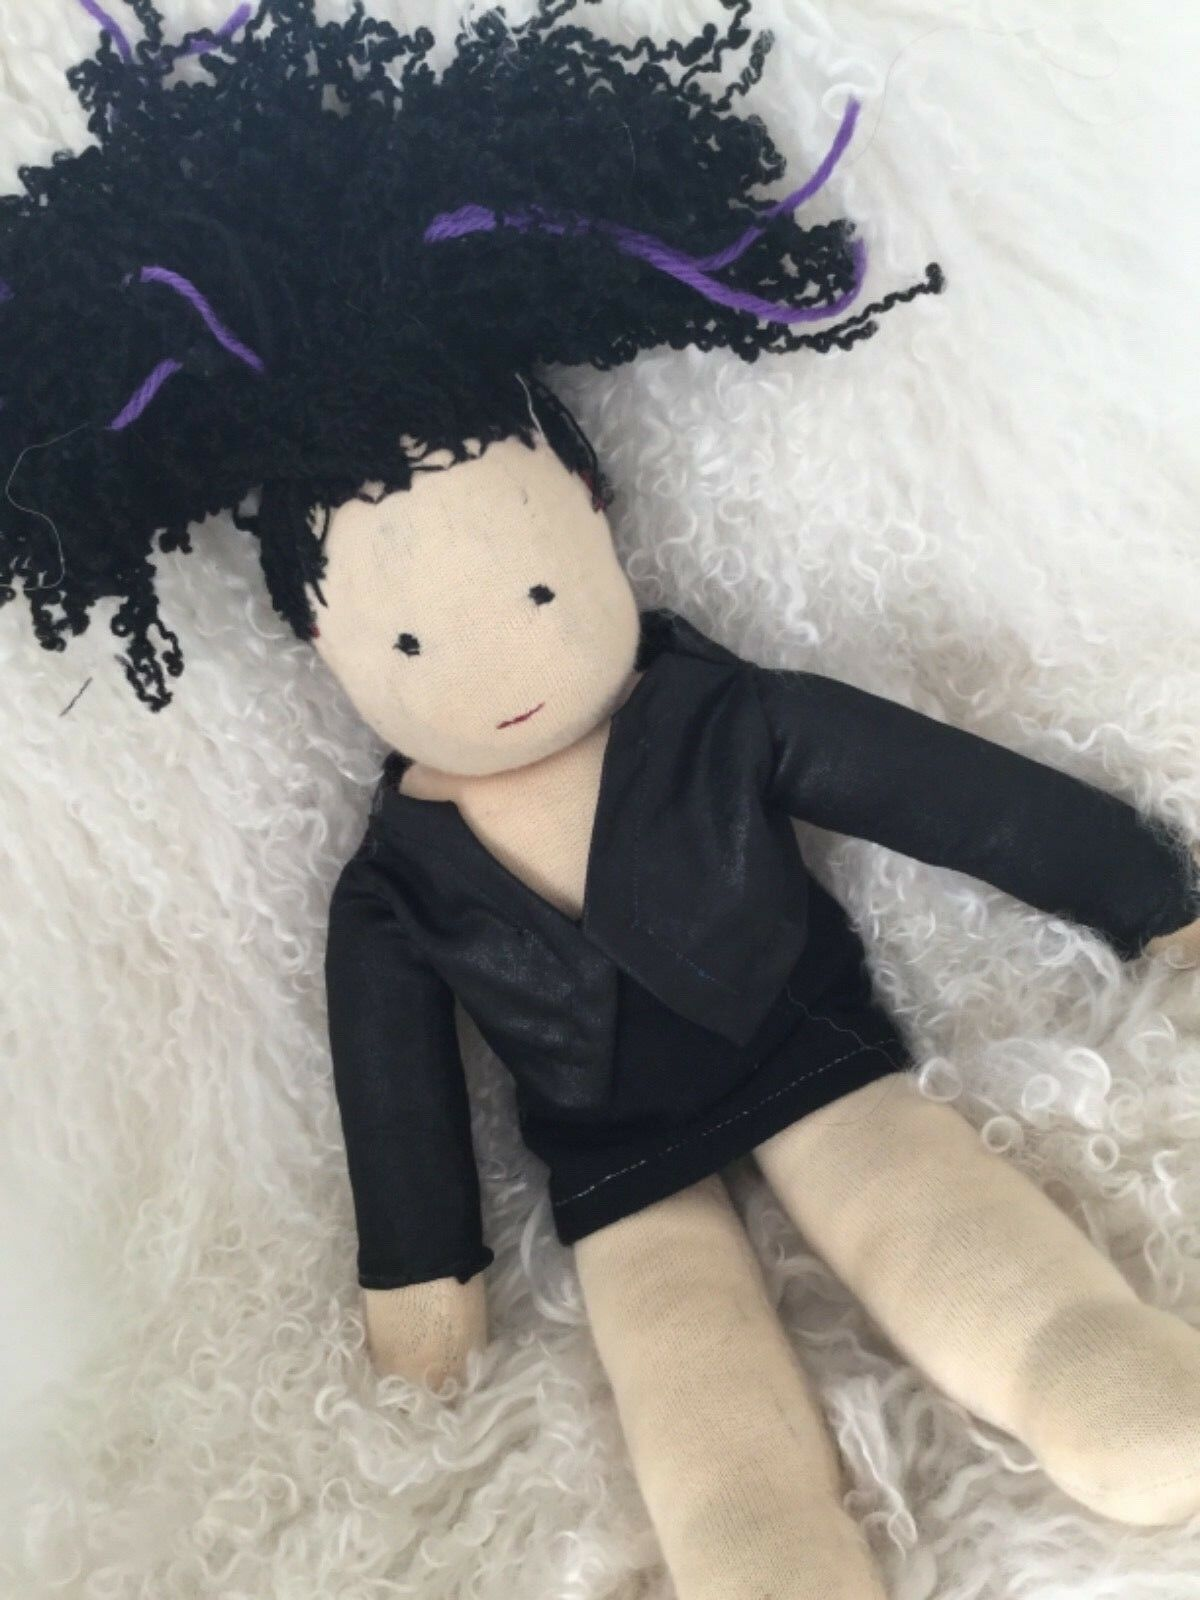 Puppe Waldorf Art, Stoffpuppe  ️ Waldorfpuppe Popstar  Handmade  ca 43  cm